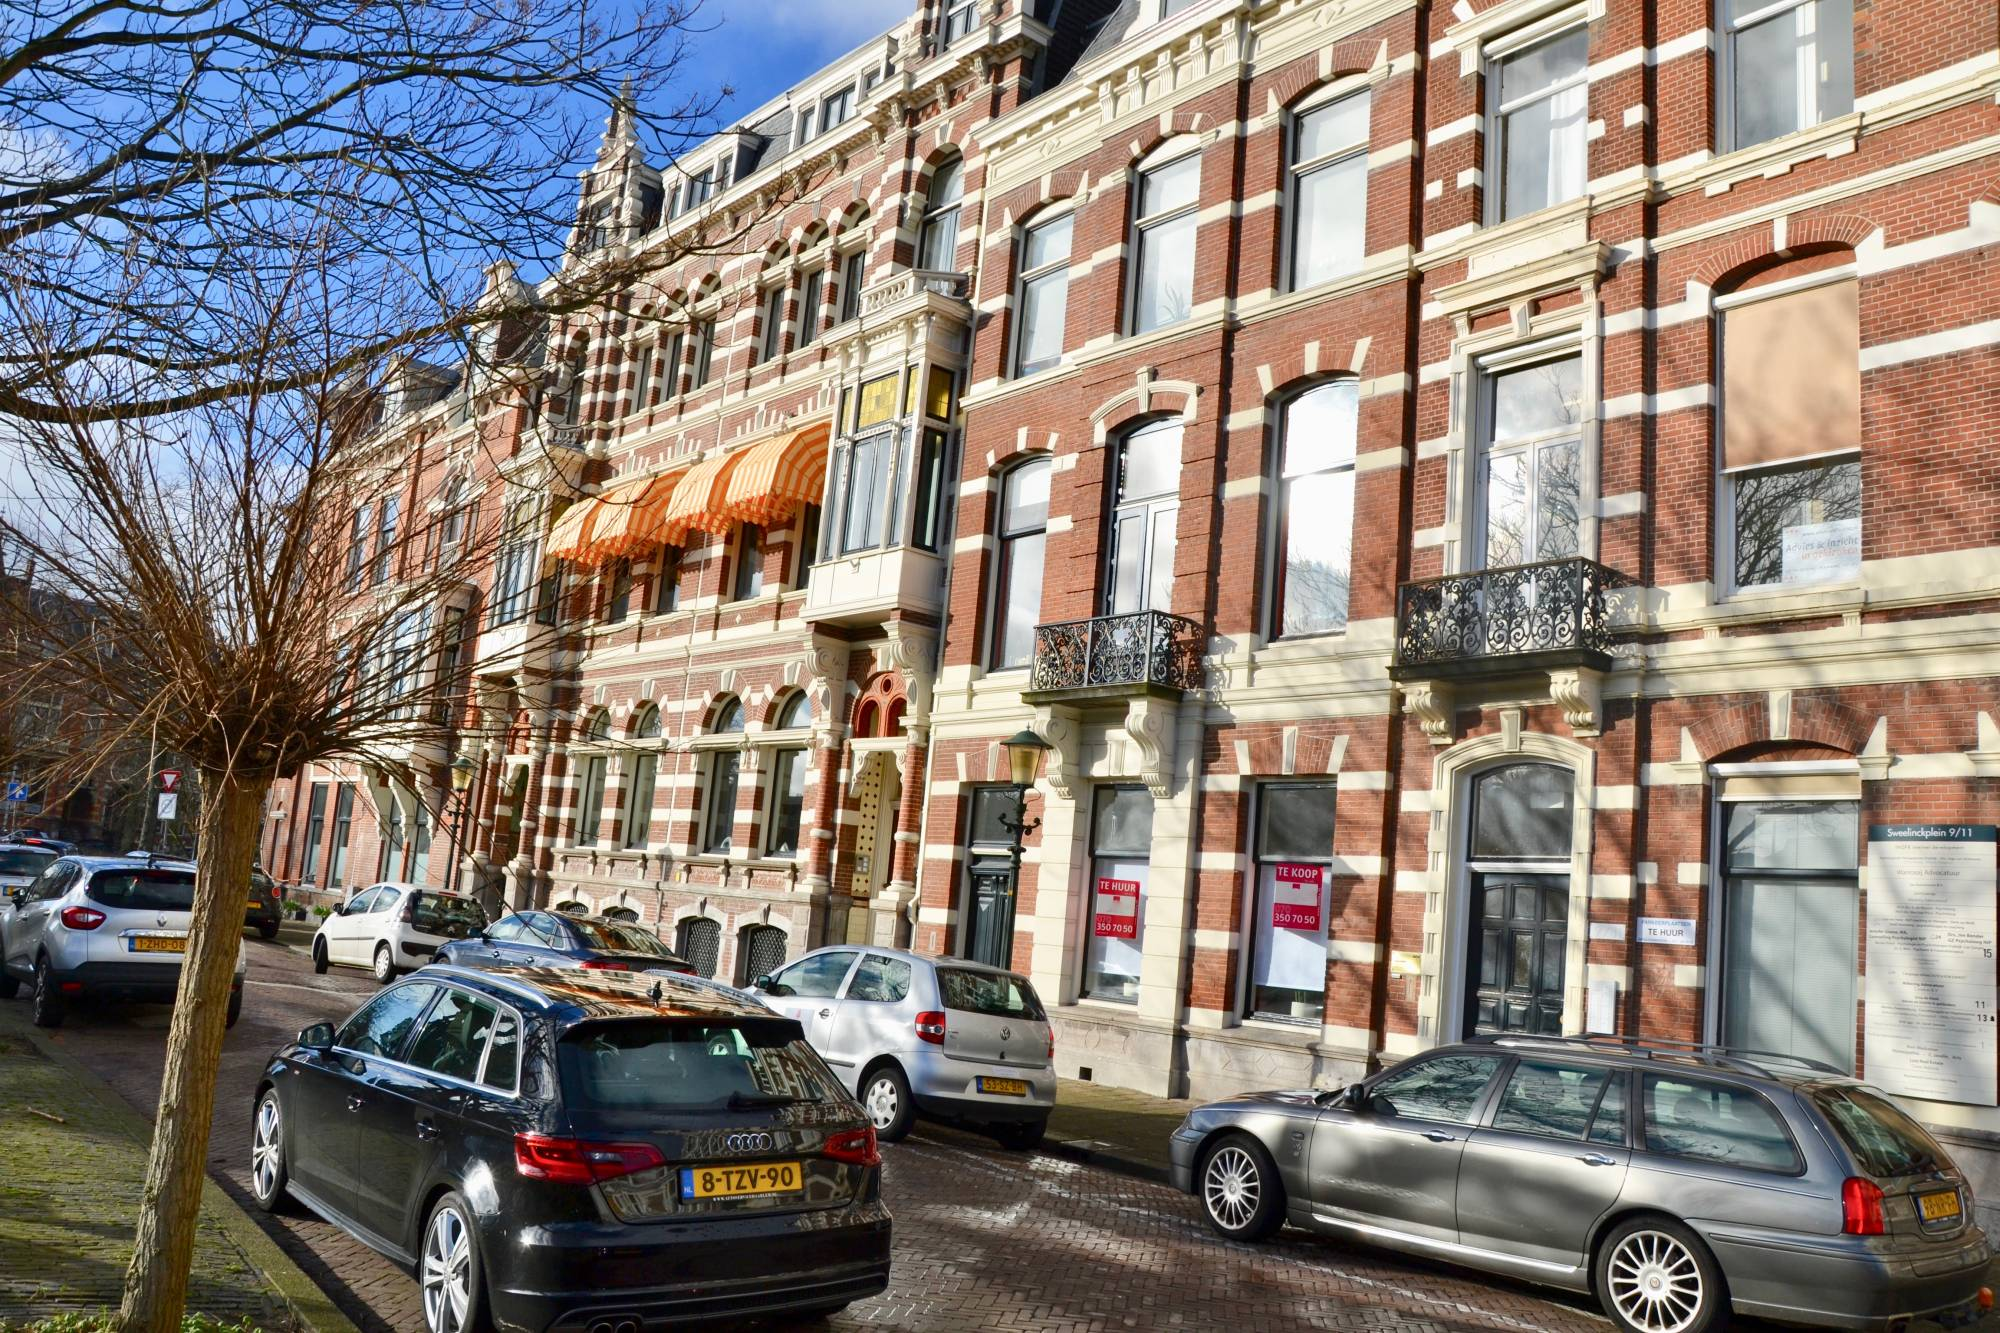 Den Haag, Sweelinckplein 12